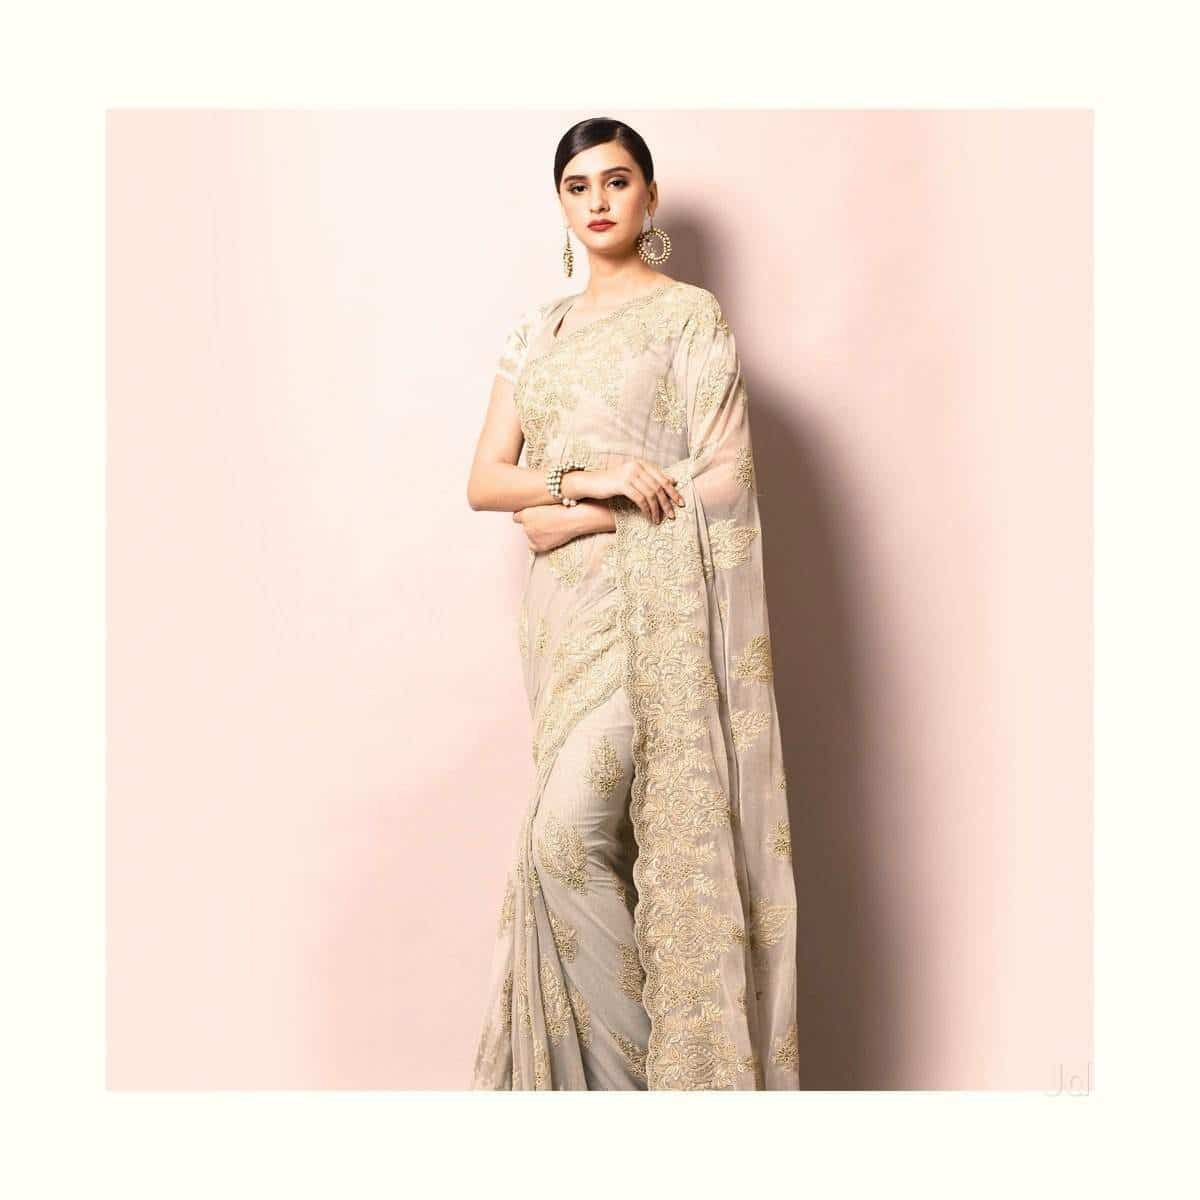 a7695cfddfeda Top Bridal Wear Retailers in Kolkata - Best Garment Readymade ...